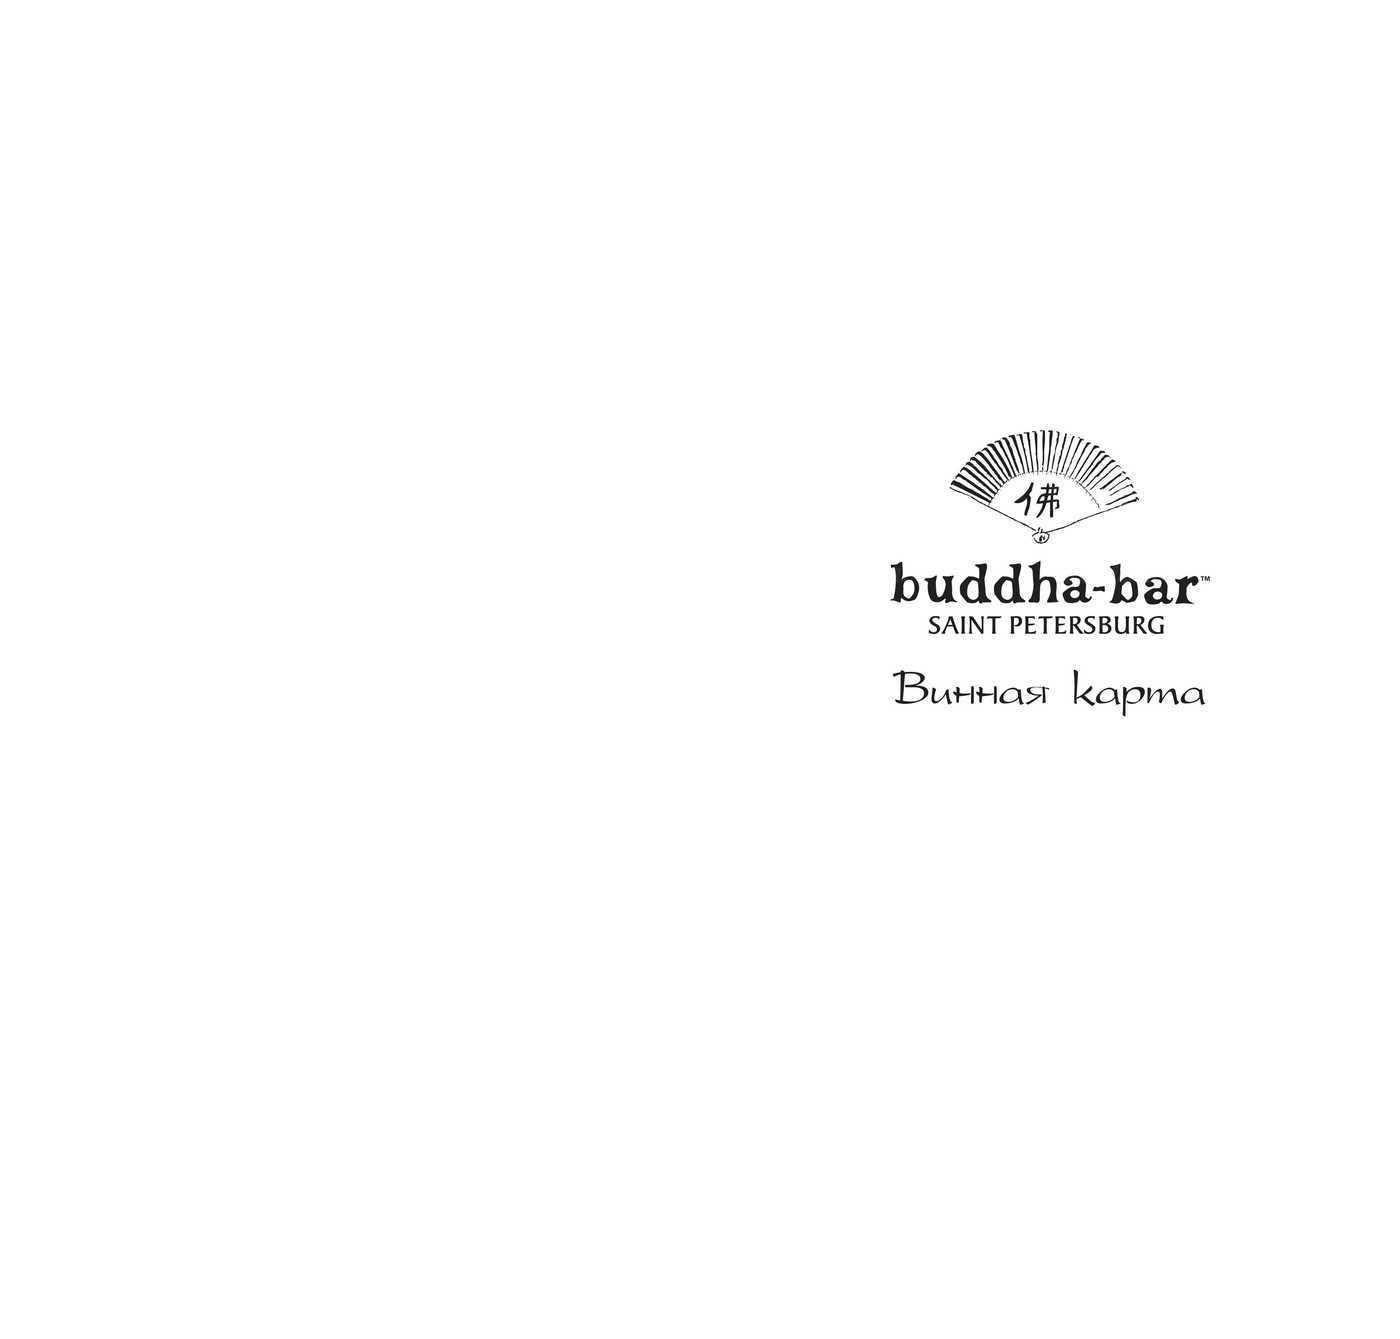 Меню ресторана Будда Бар (Buddha-Bar) на Синопской набережной фото 12